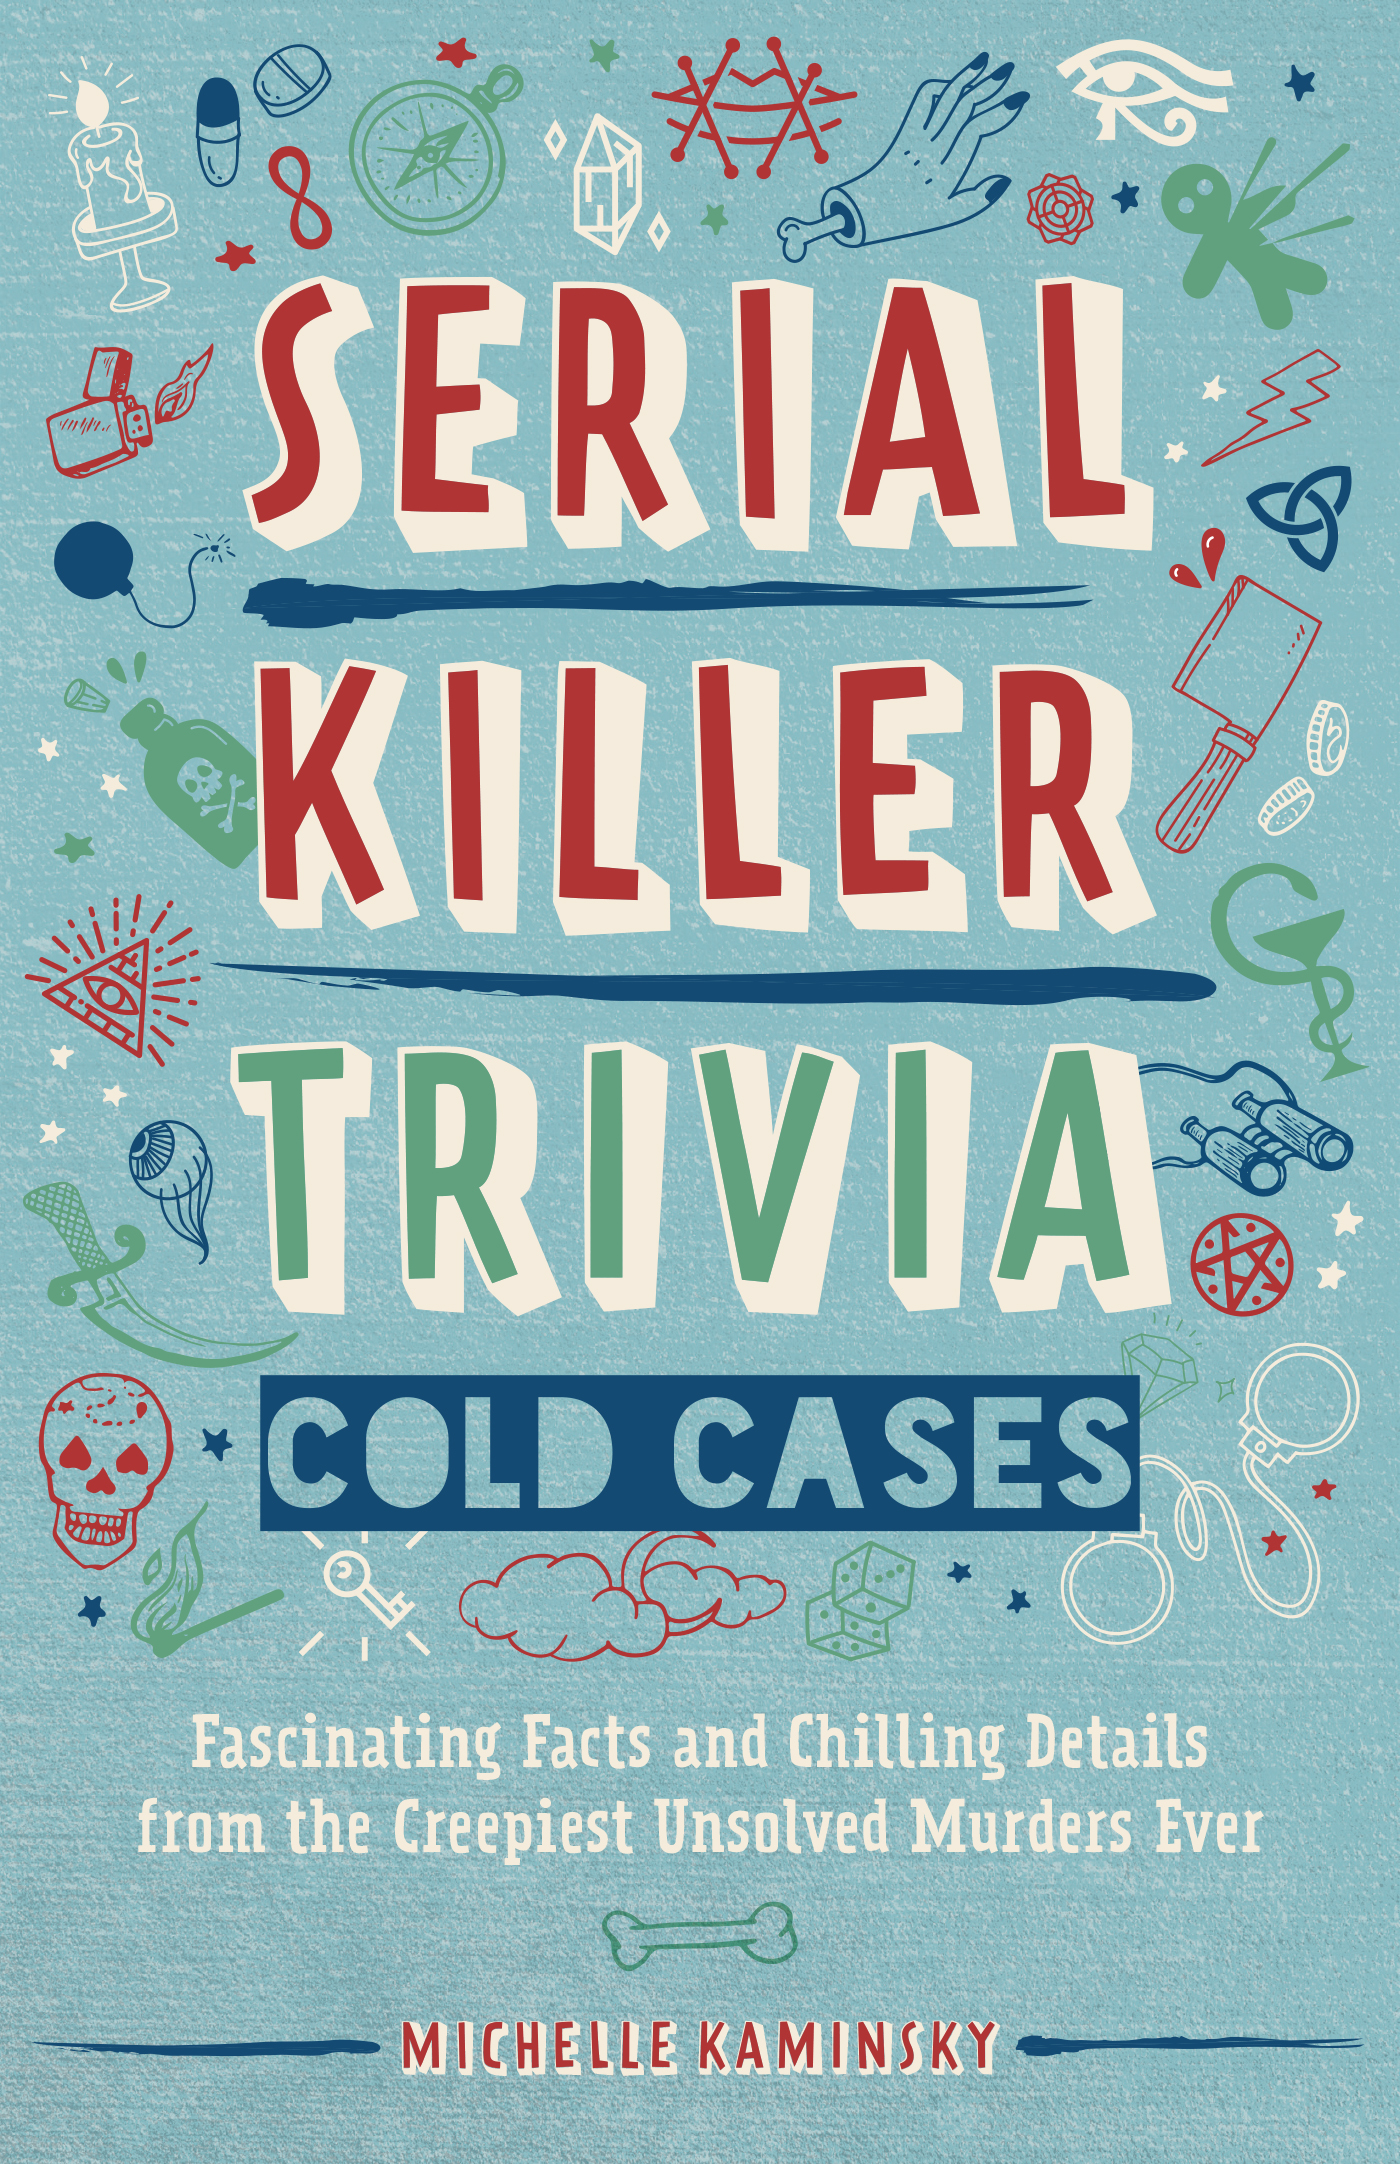 Serial Killer Trivia Cold Cases